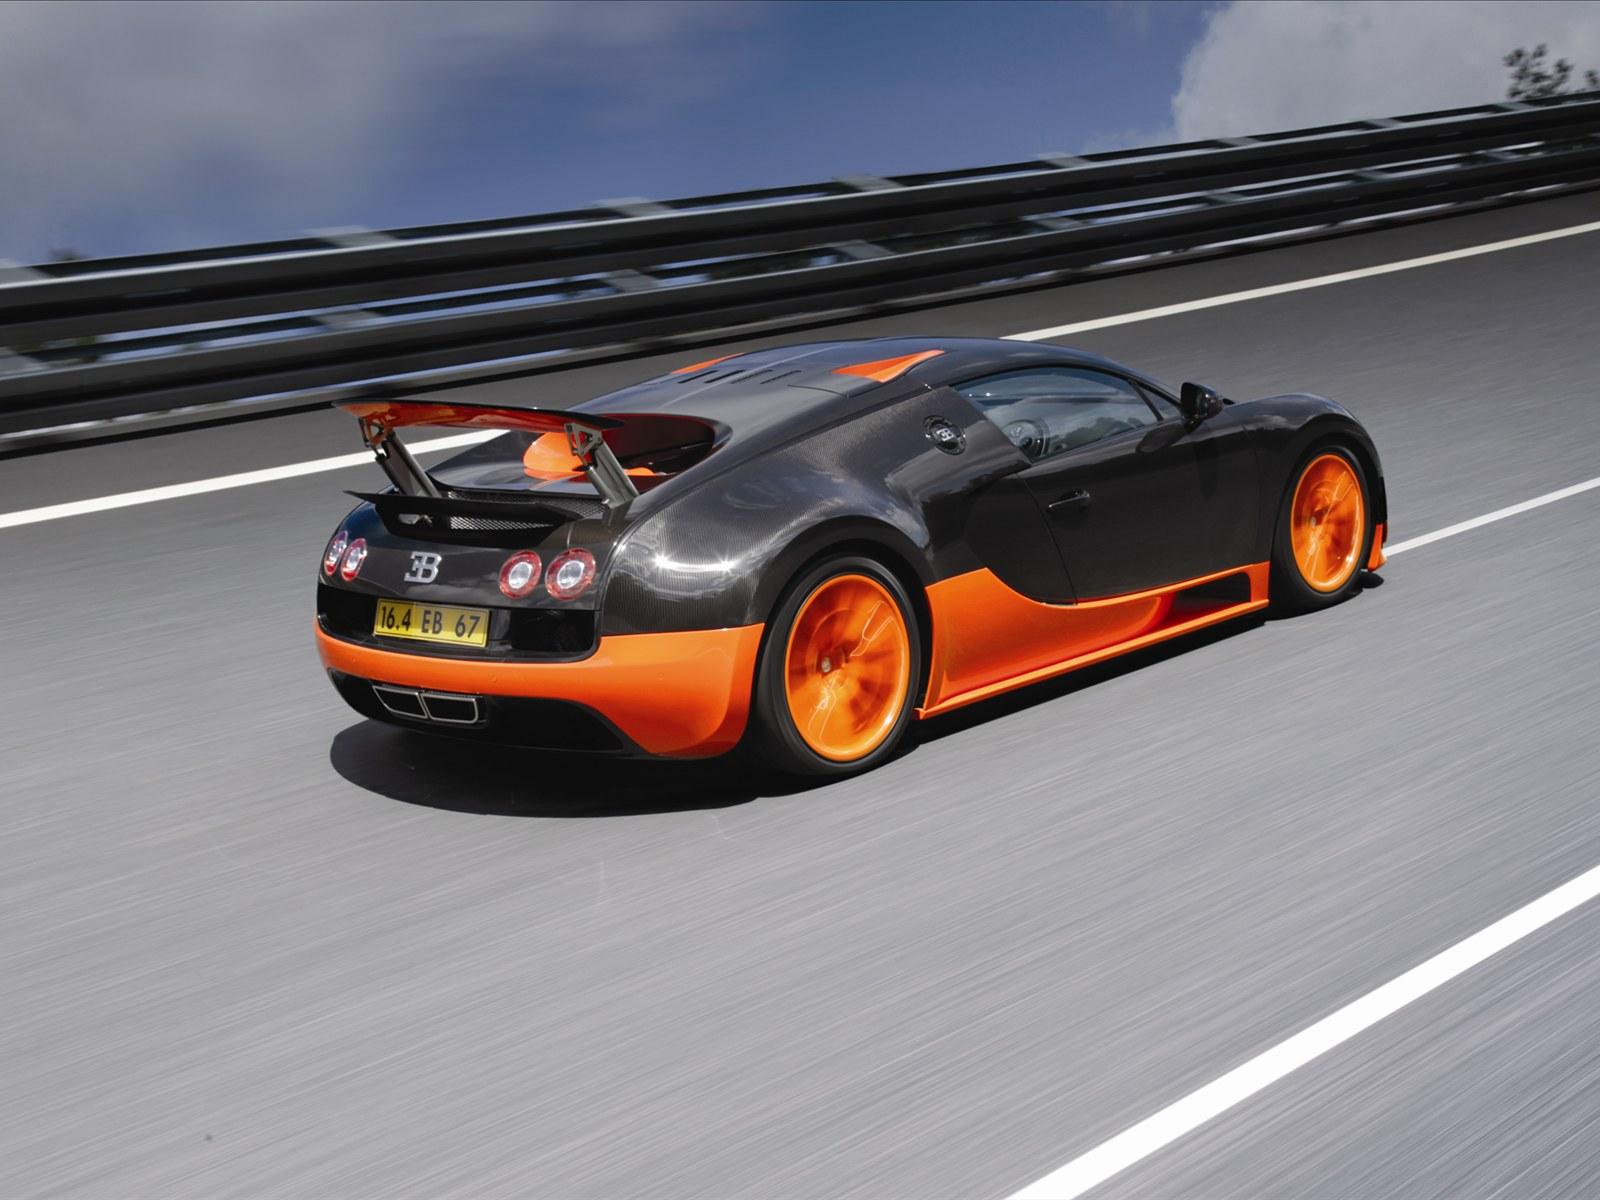 sport car bugatti veyron super sport 2011. Black Bedroom Furniture Sets. Home Design Ideas